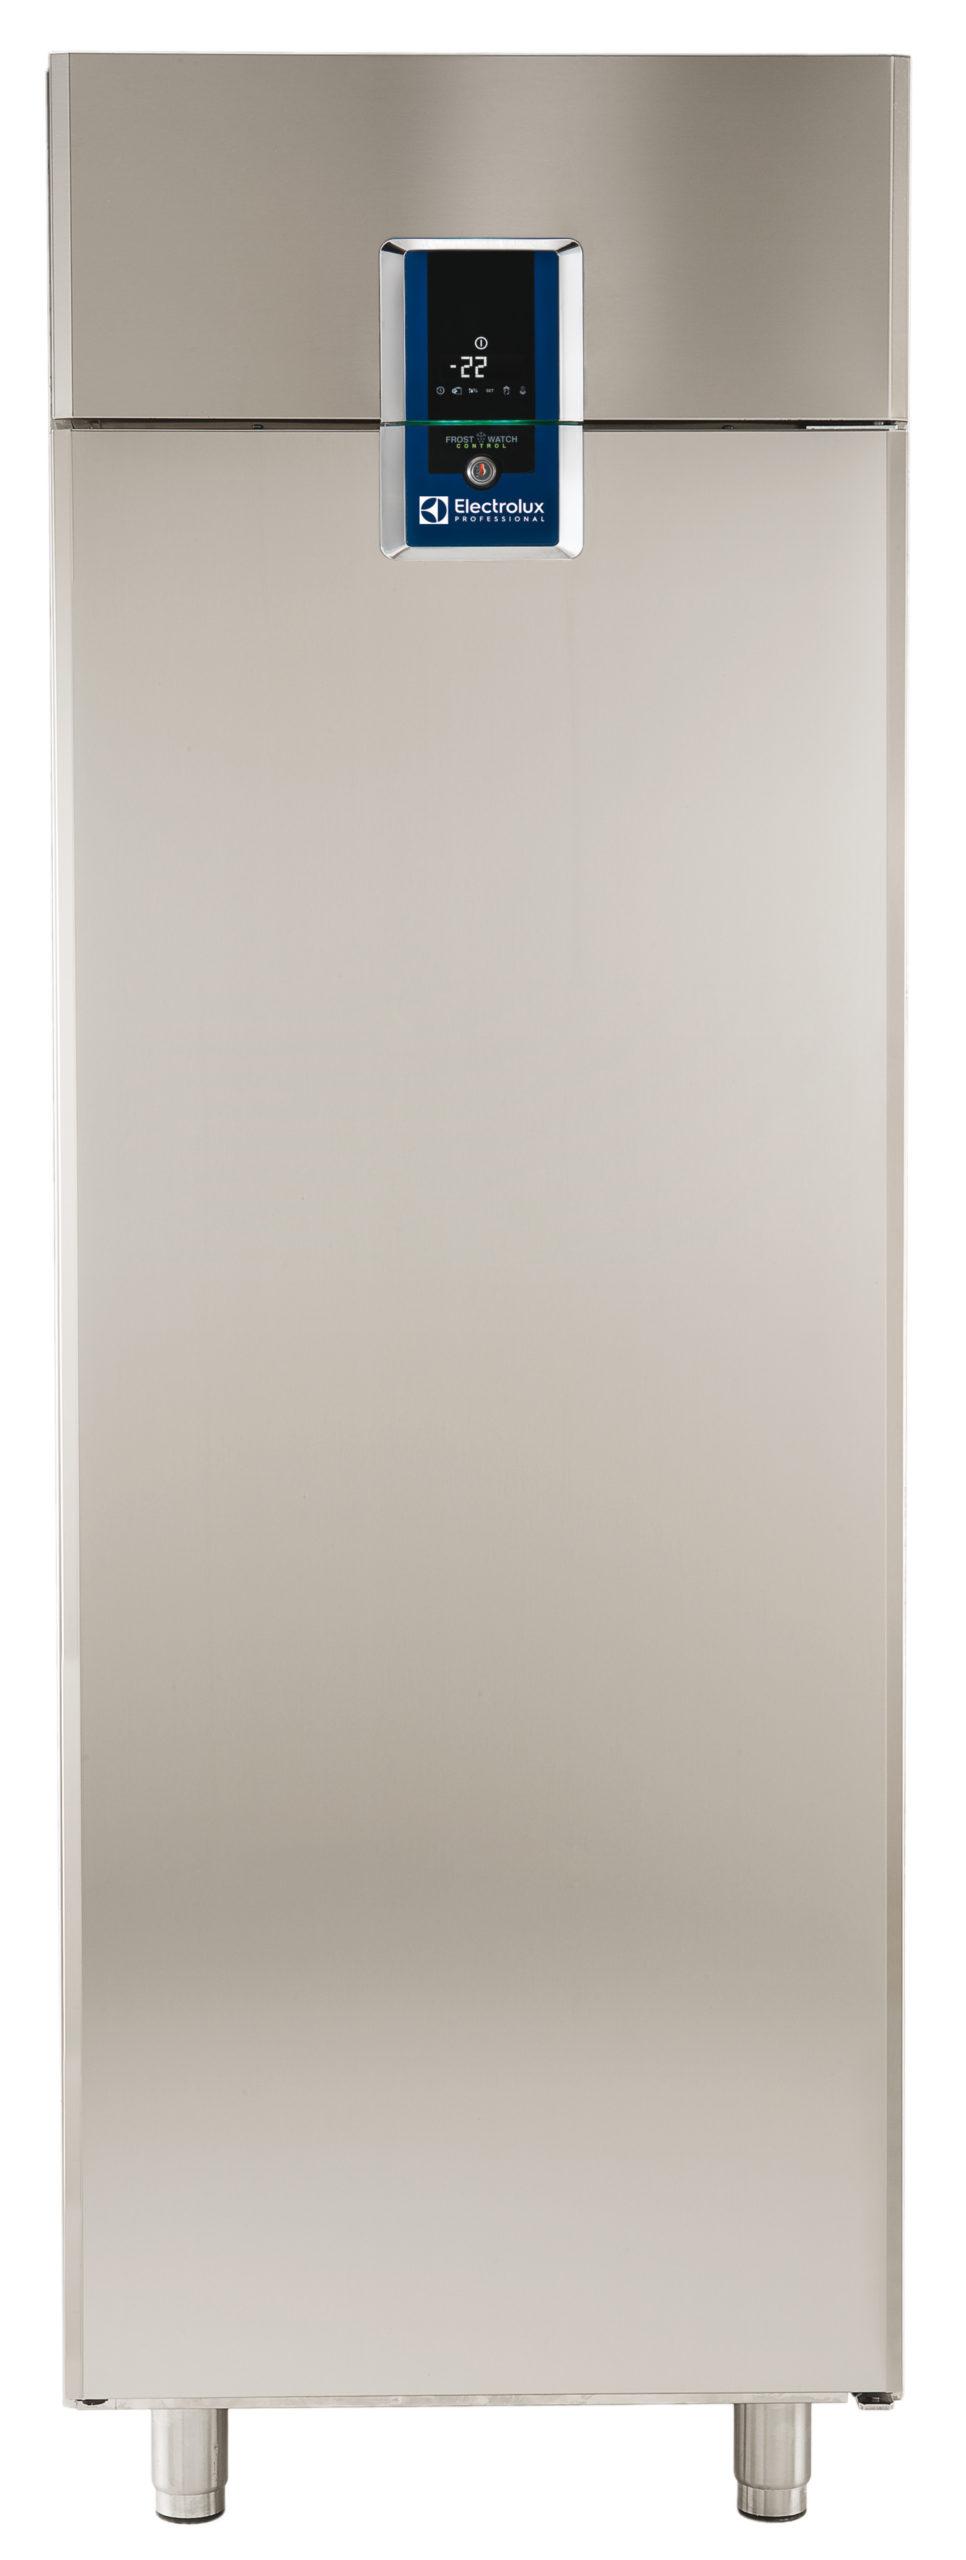 Electrolux ecostore Premium fryseskabe – R290